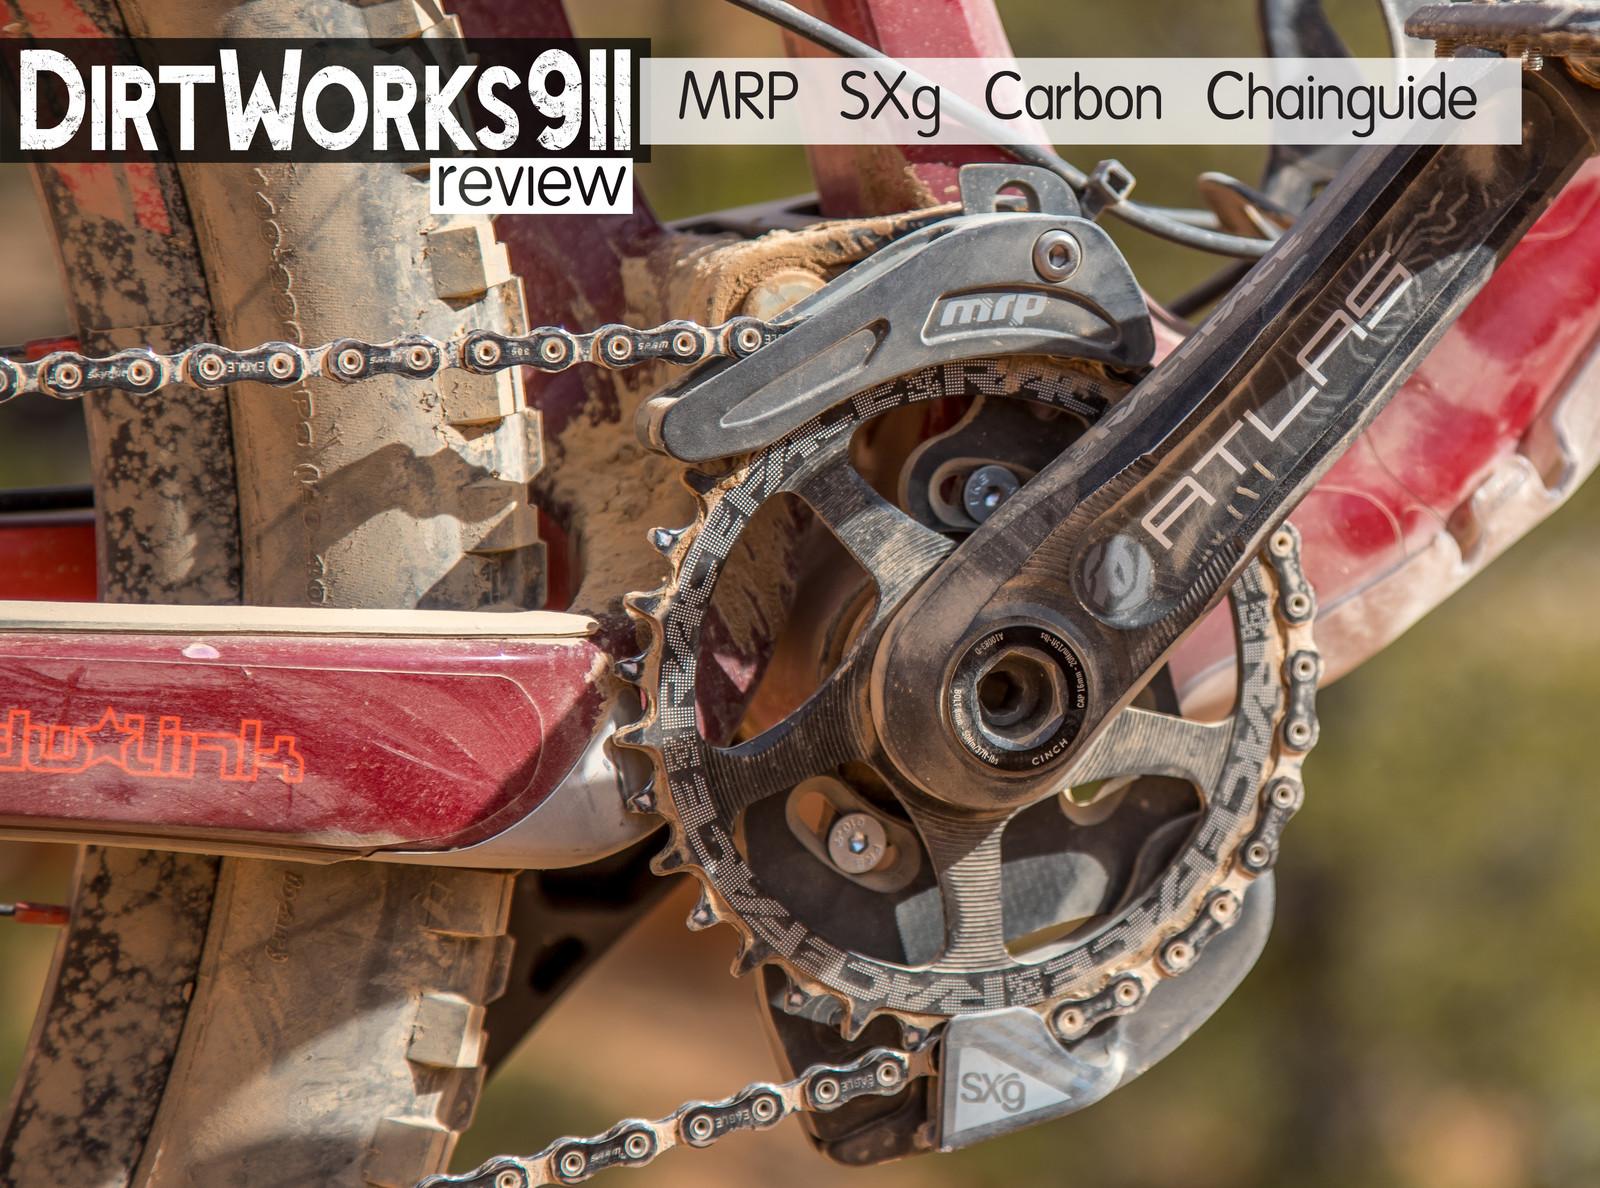 MRP SXg Chainguide